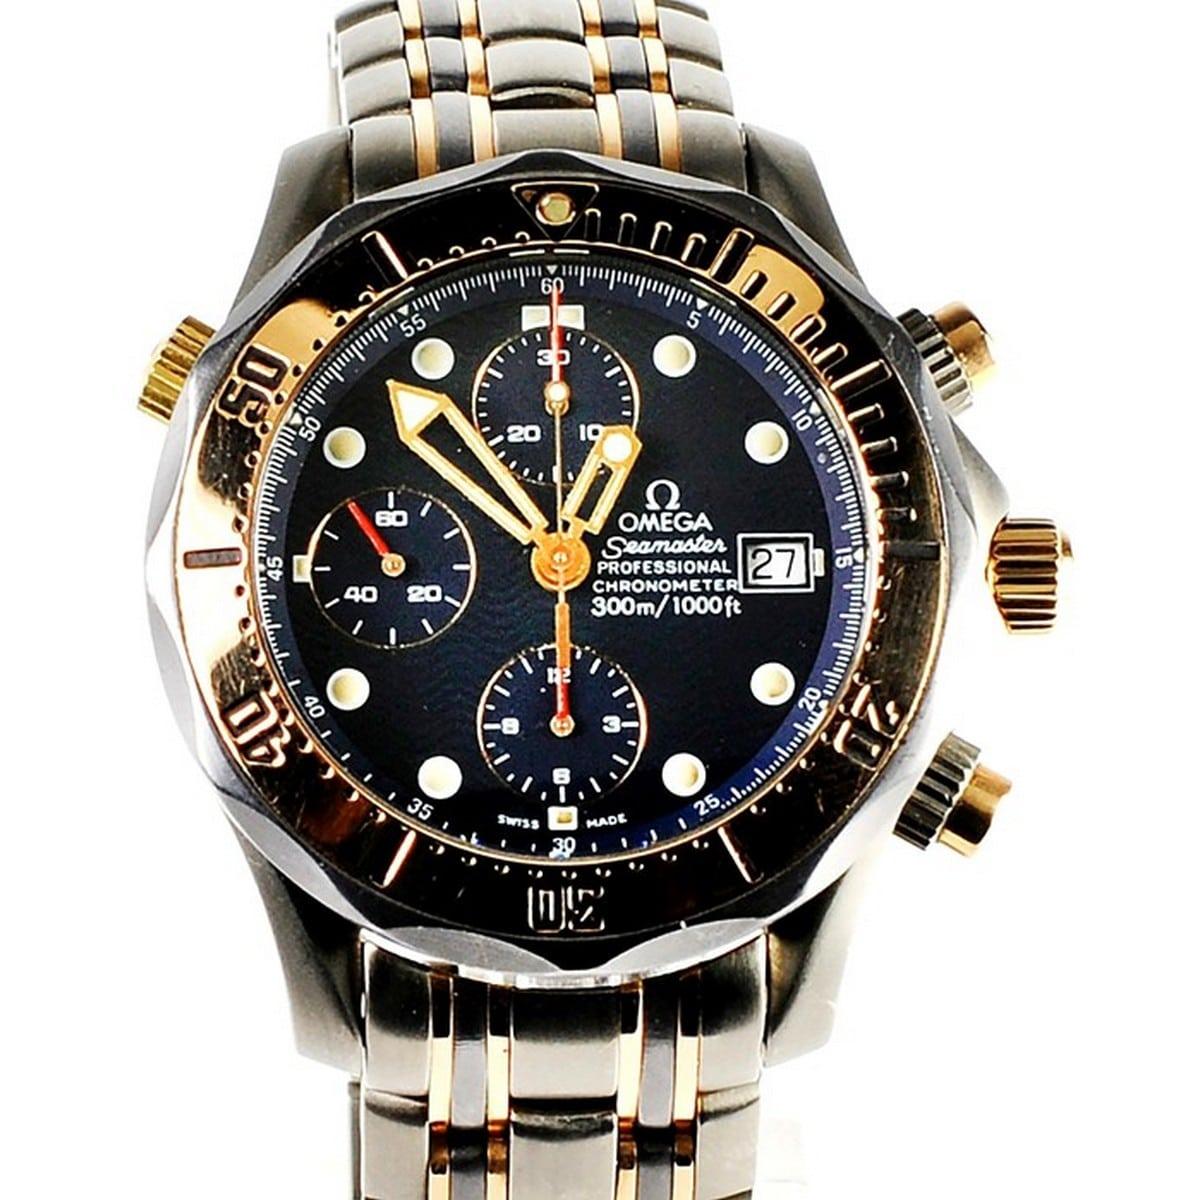 Omega Seamaster Diver Pro 300m